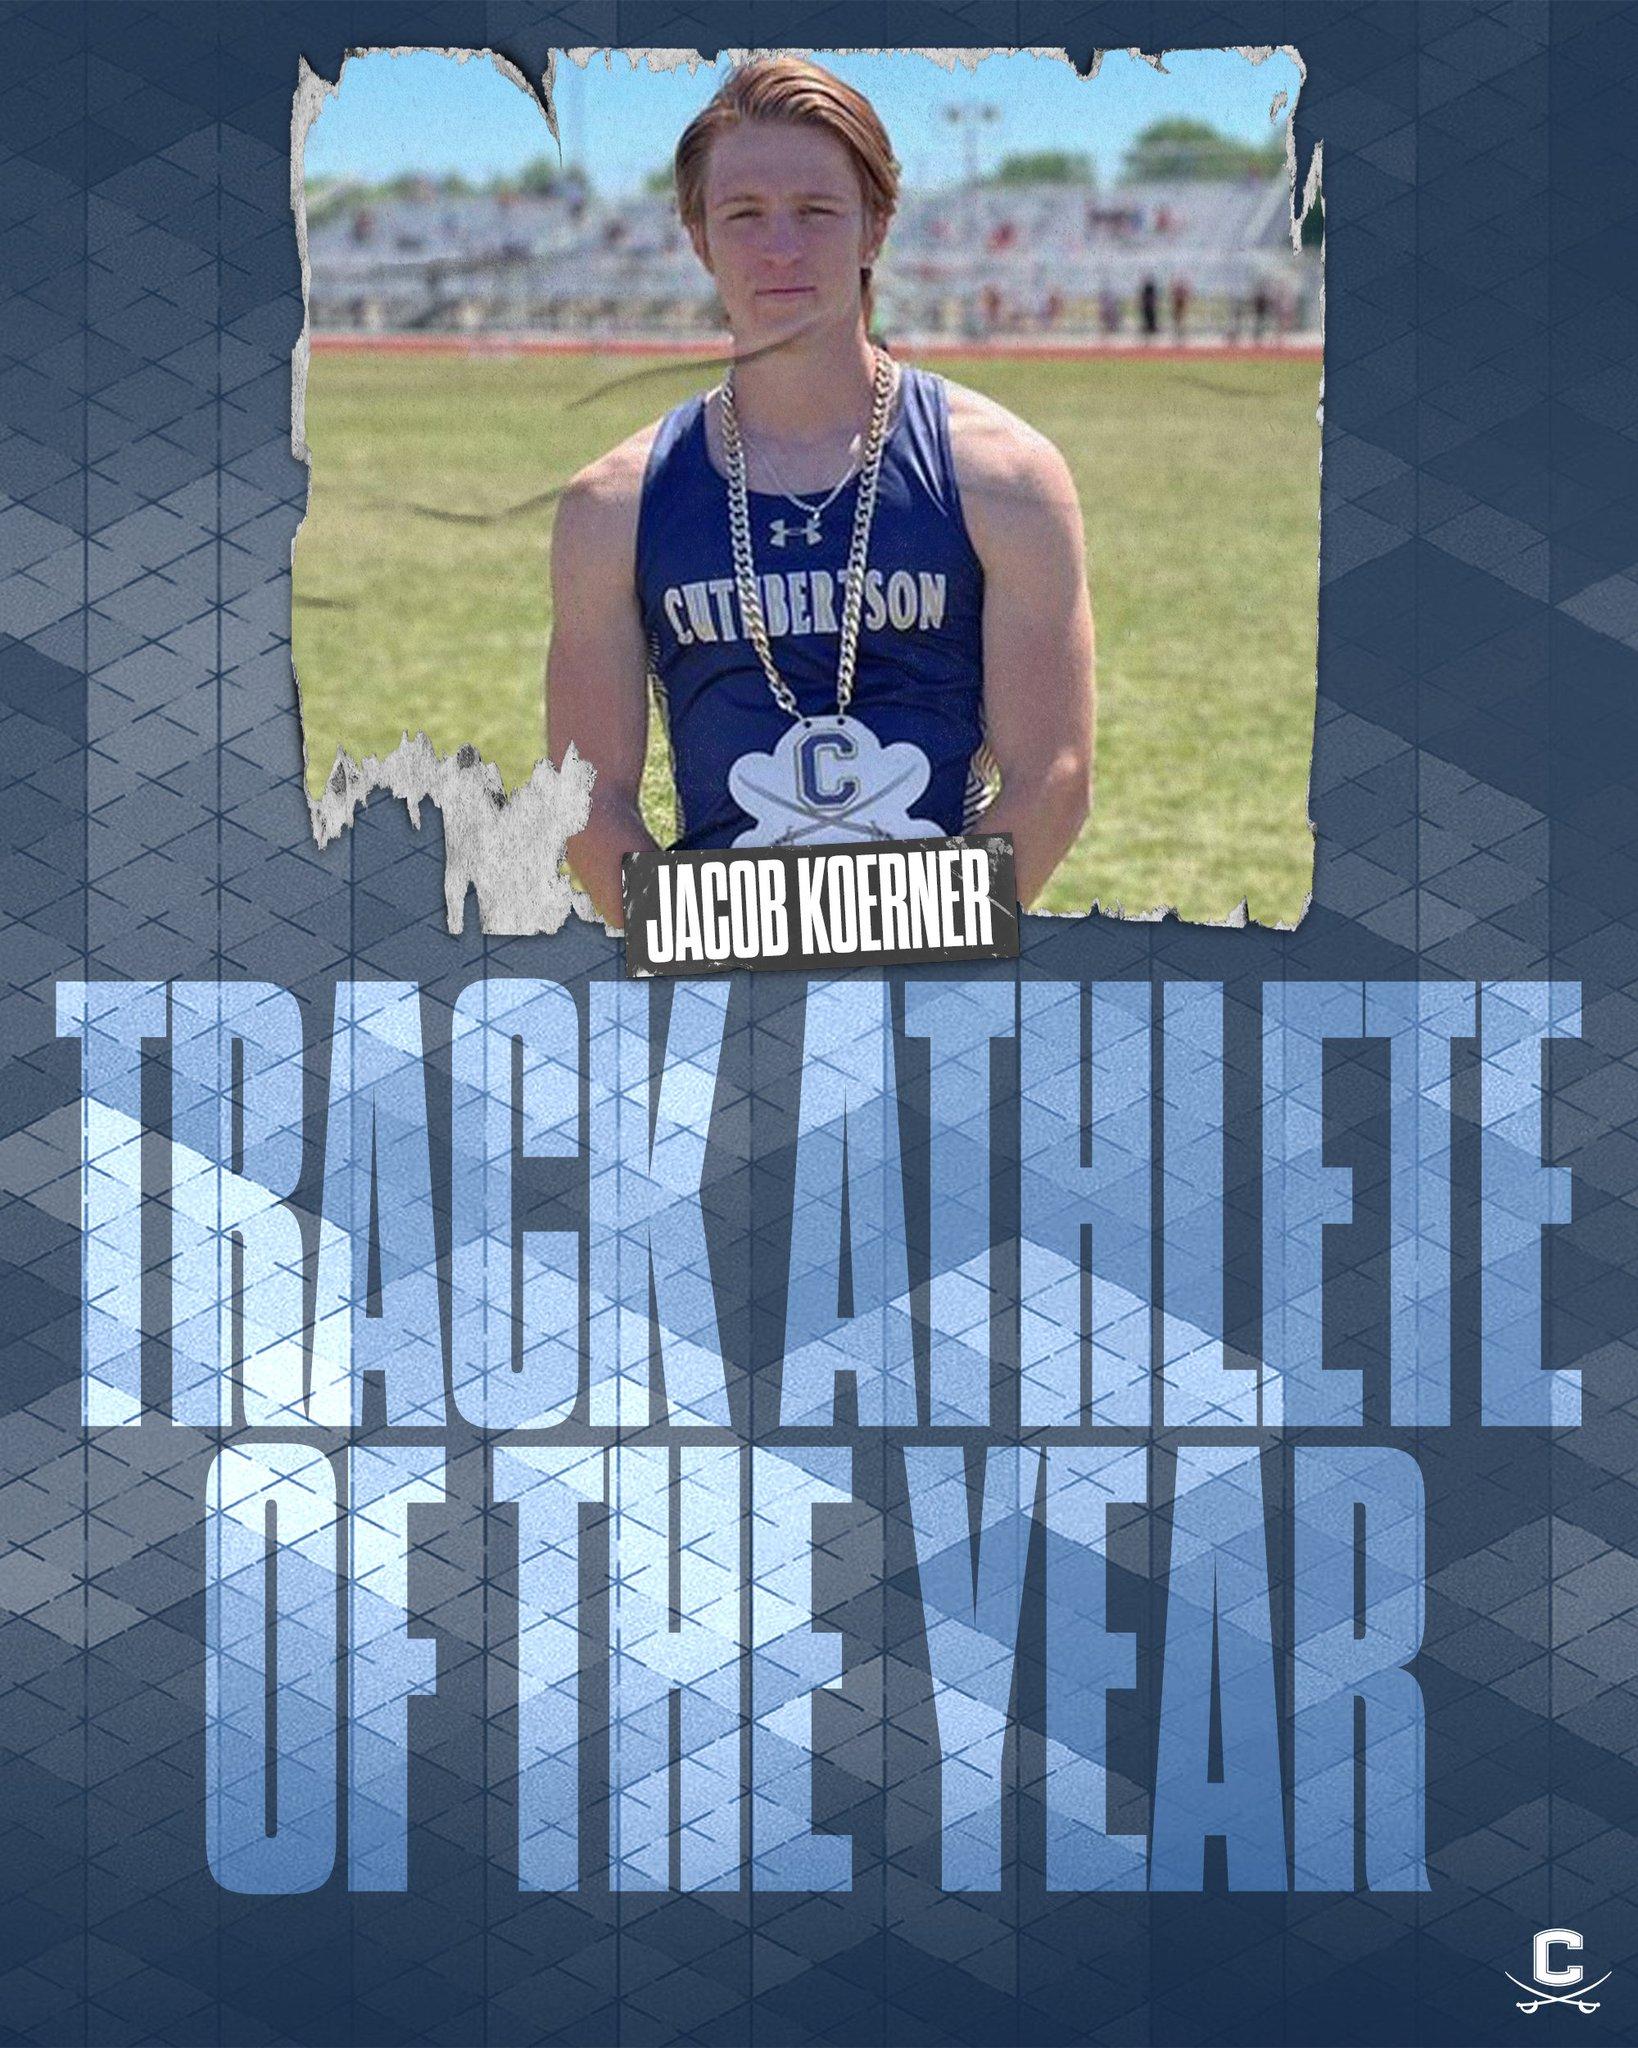 Jacob Koerner won SCC Track Athlete of the Year